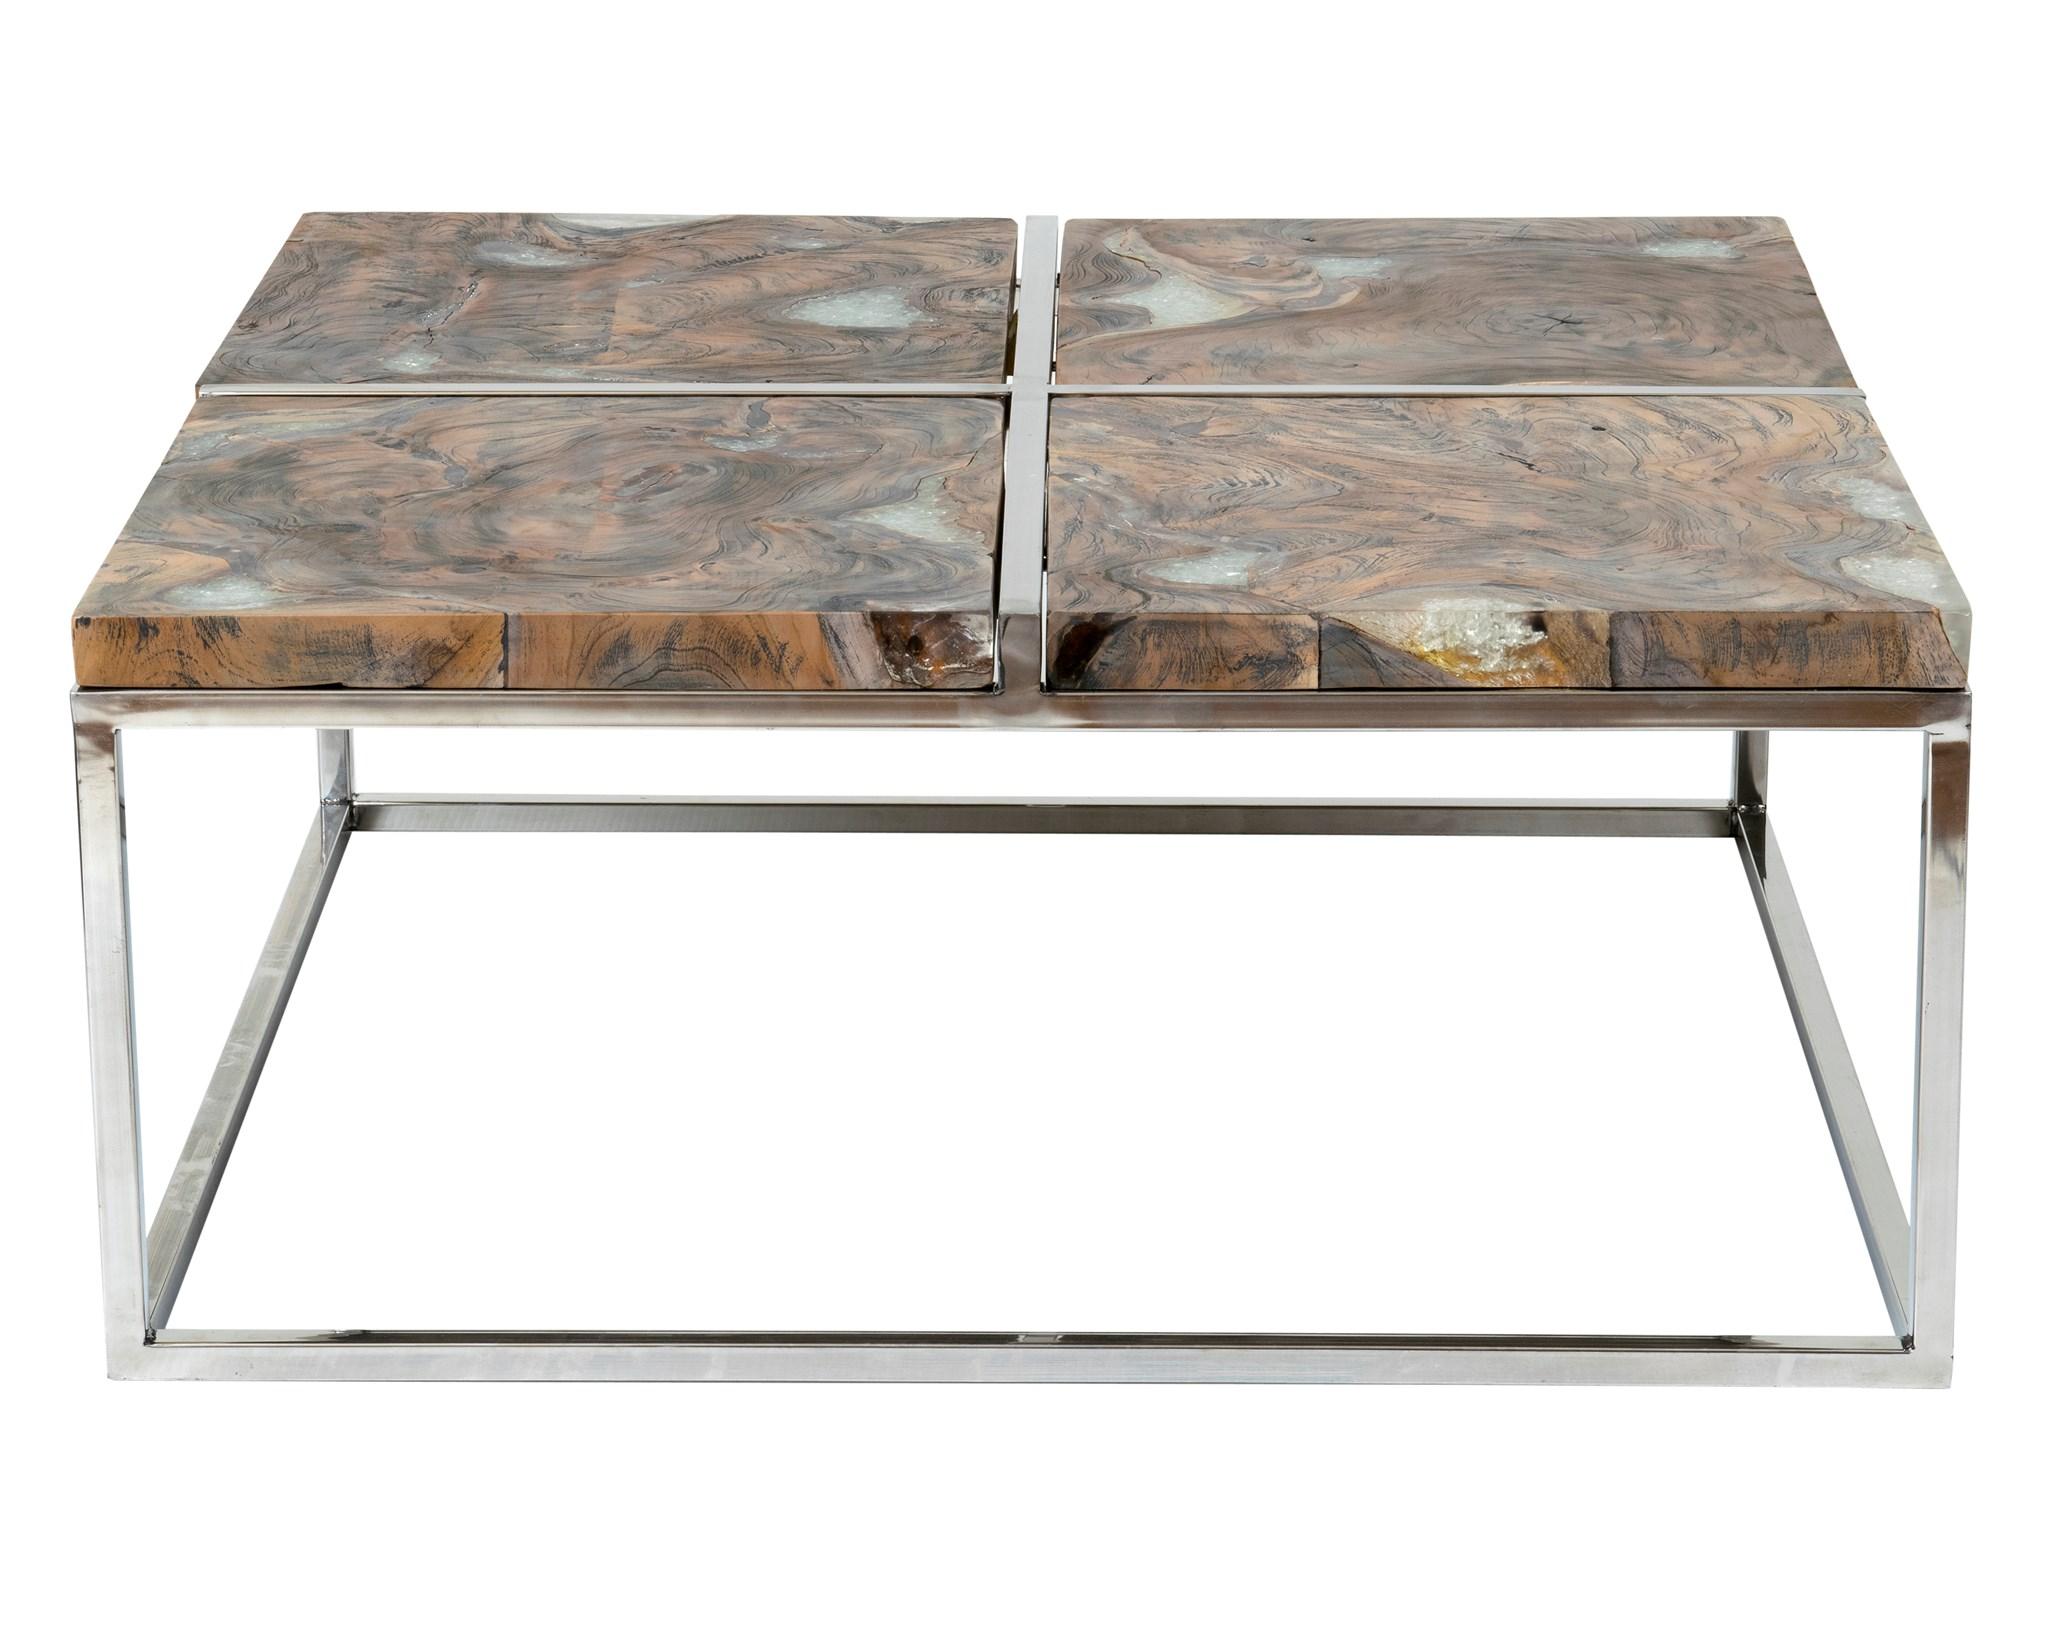 Petrified Wood Table Top Black Patina Steel Legs Live Edge Wood